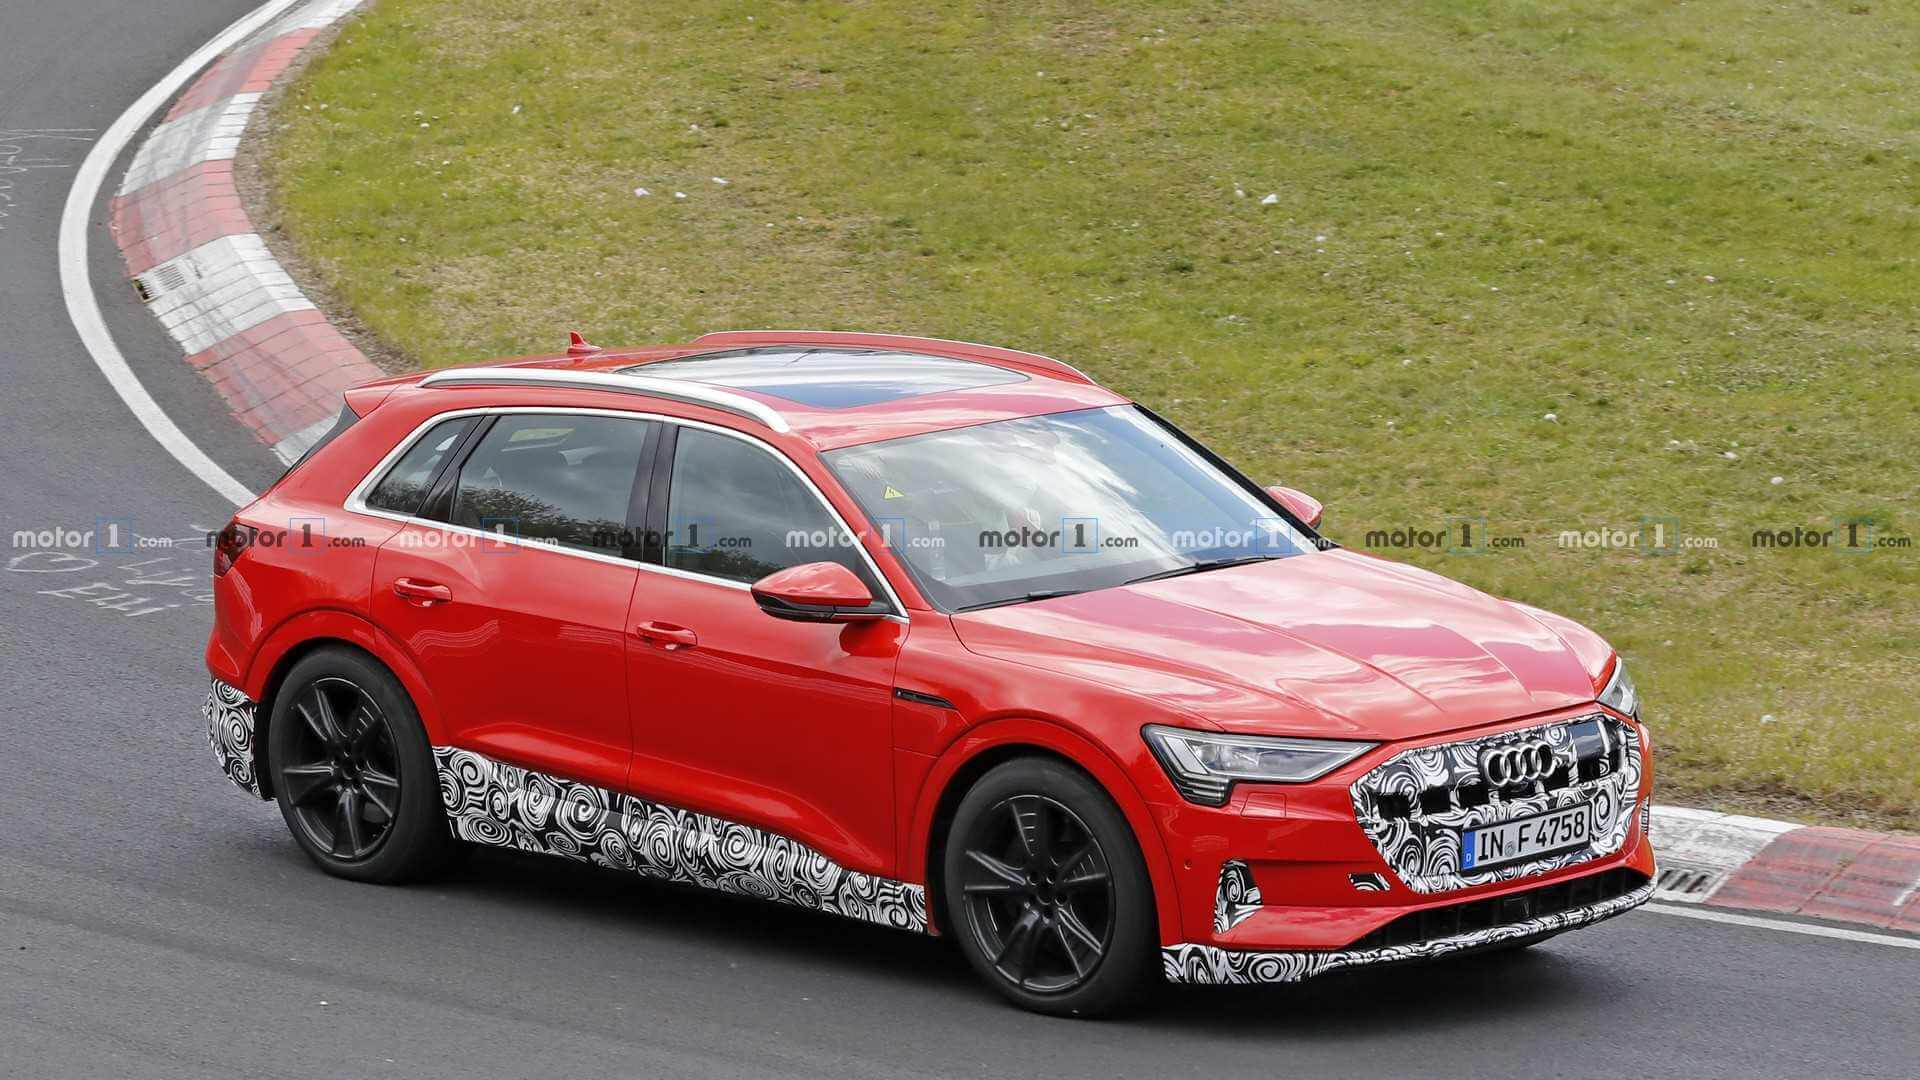 Audi e-tron QuattroS